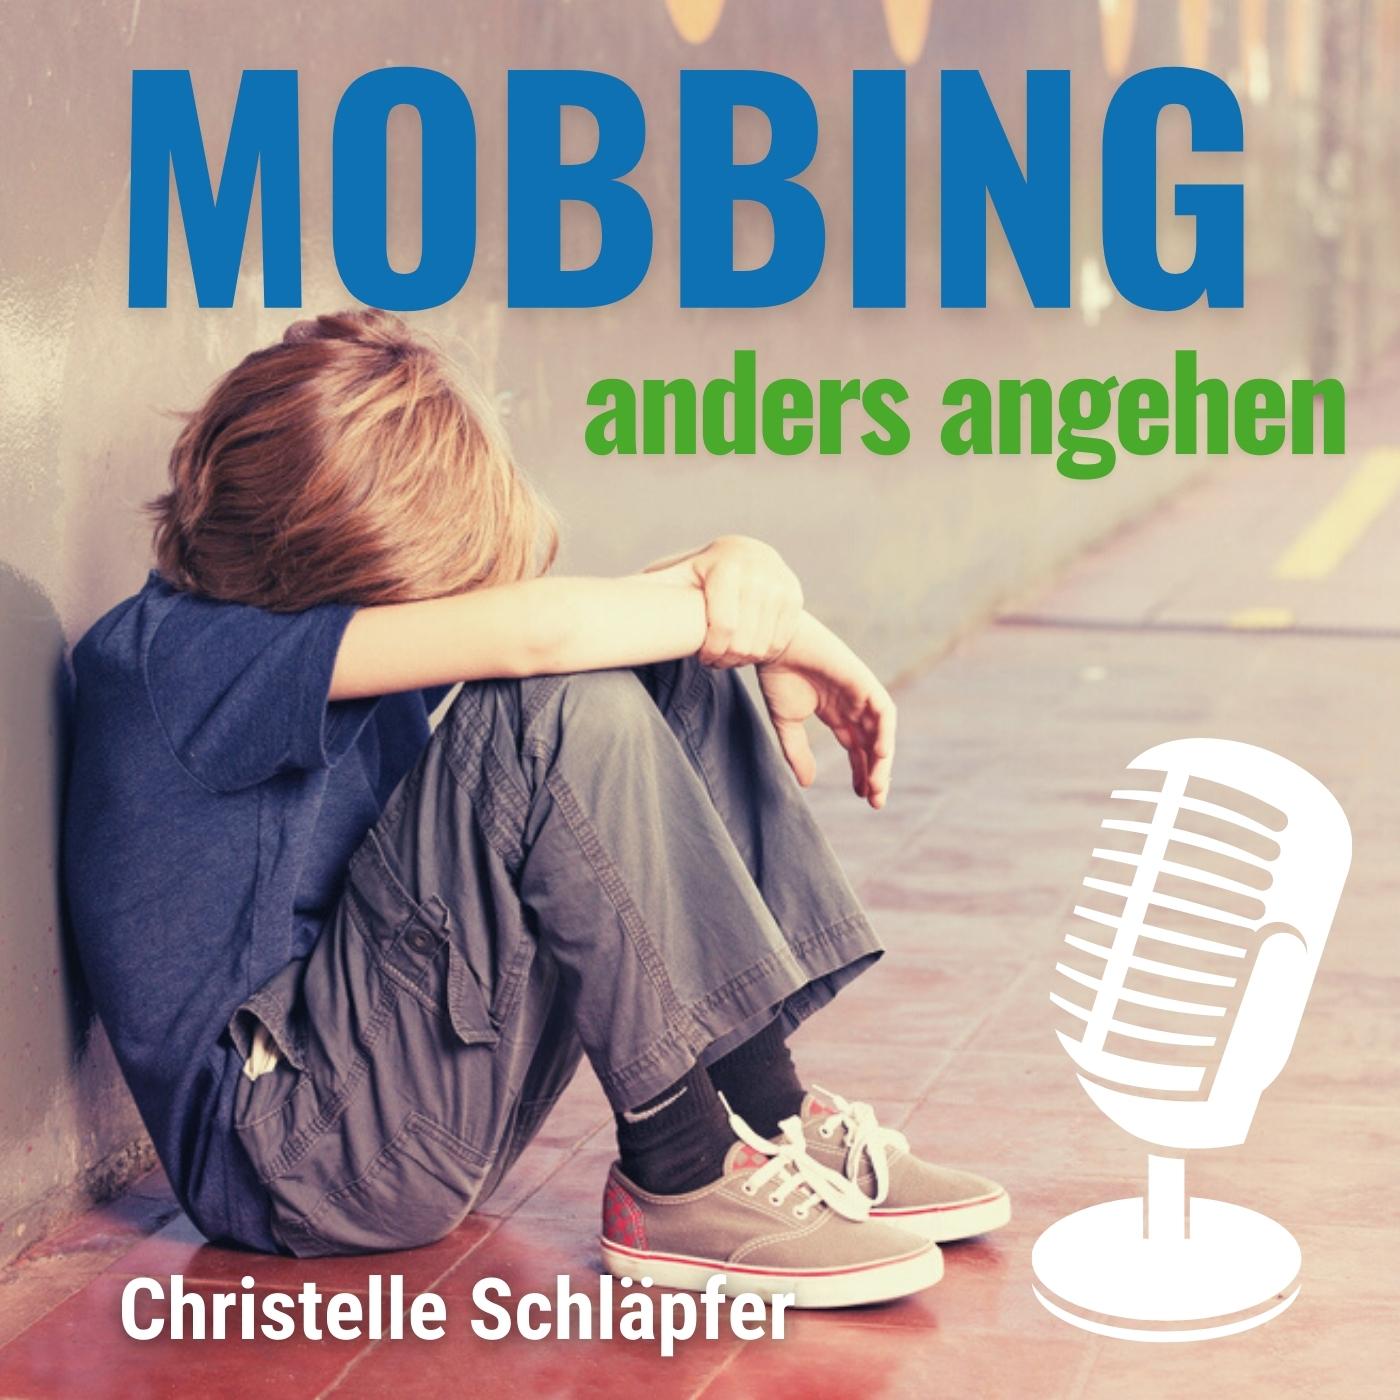 Mobbing anders angehen Podcast Cover - Mobbing und Cybermobbing reduzieren